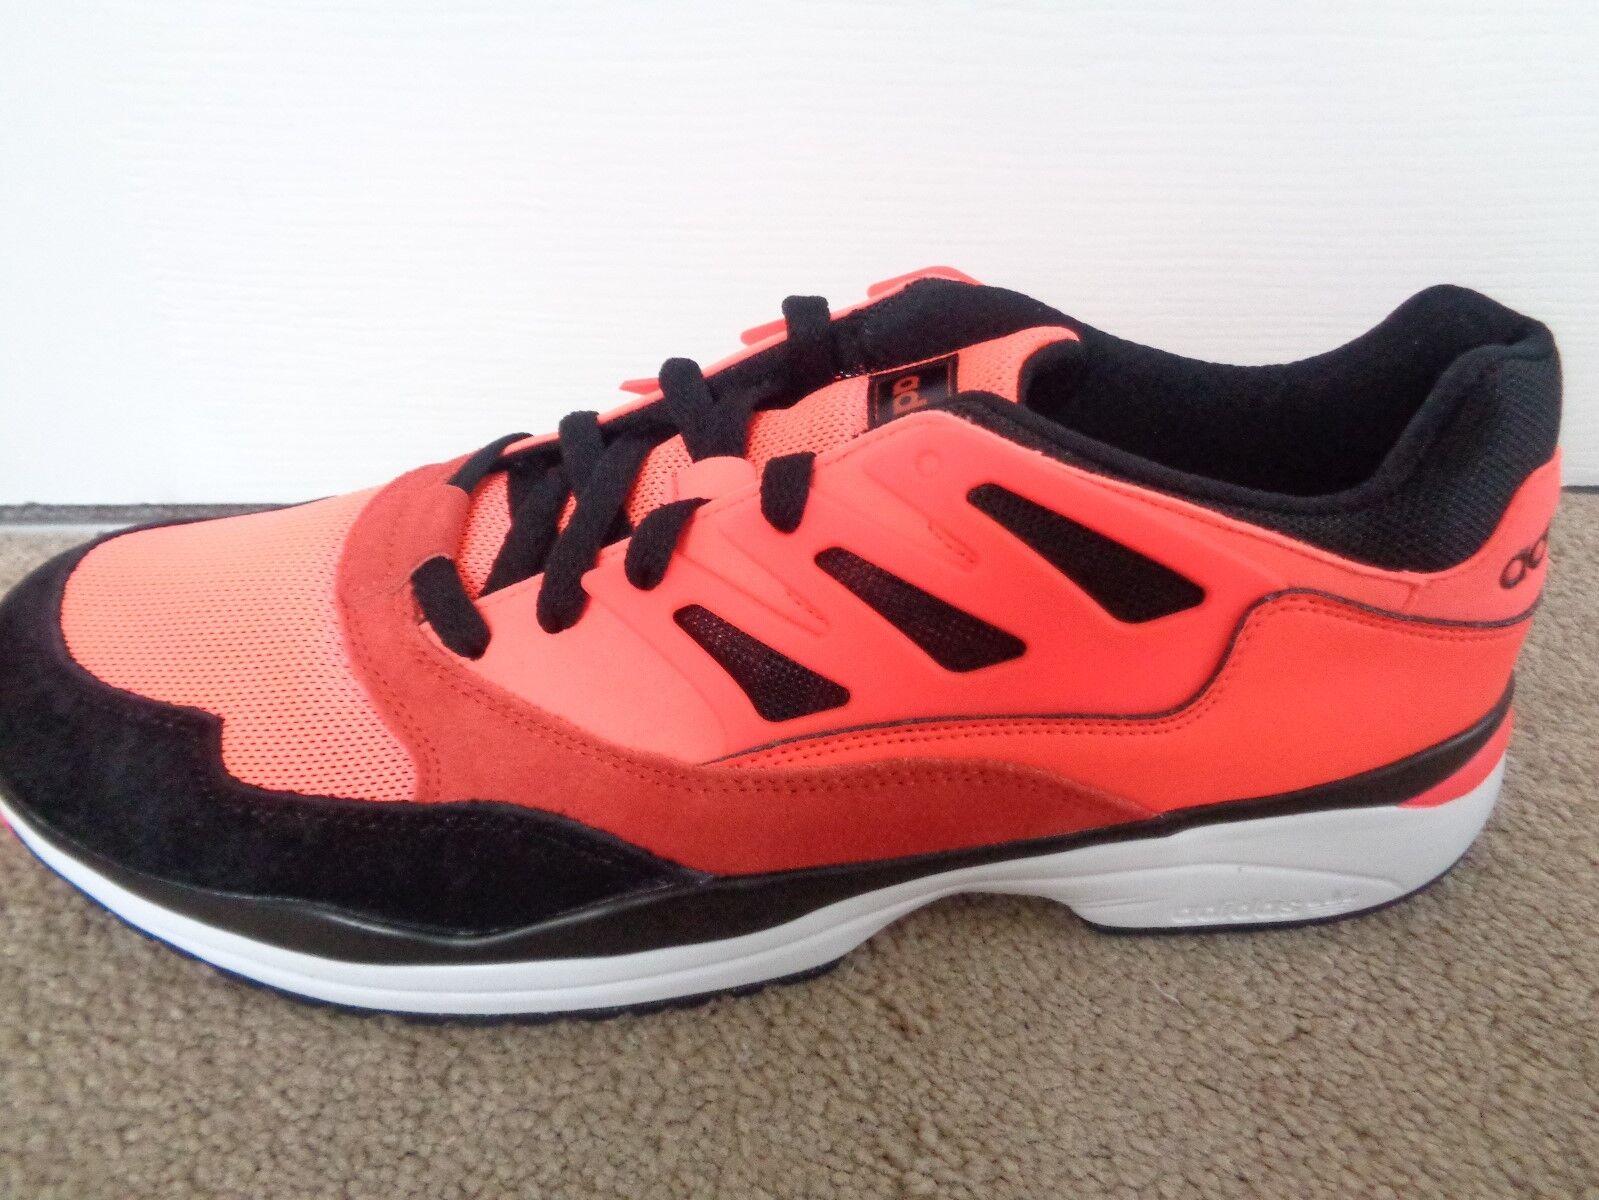 Adidas Torsion EU Allegra X Baskets Q20346112 EU Torsion 47 213 US 12.5 Neuf + Boîte dcf73f